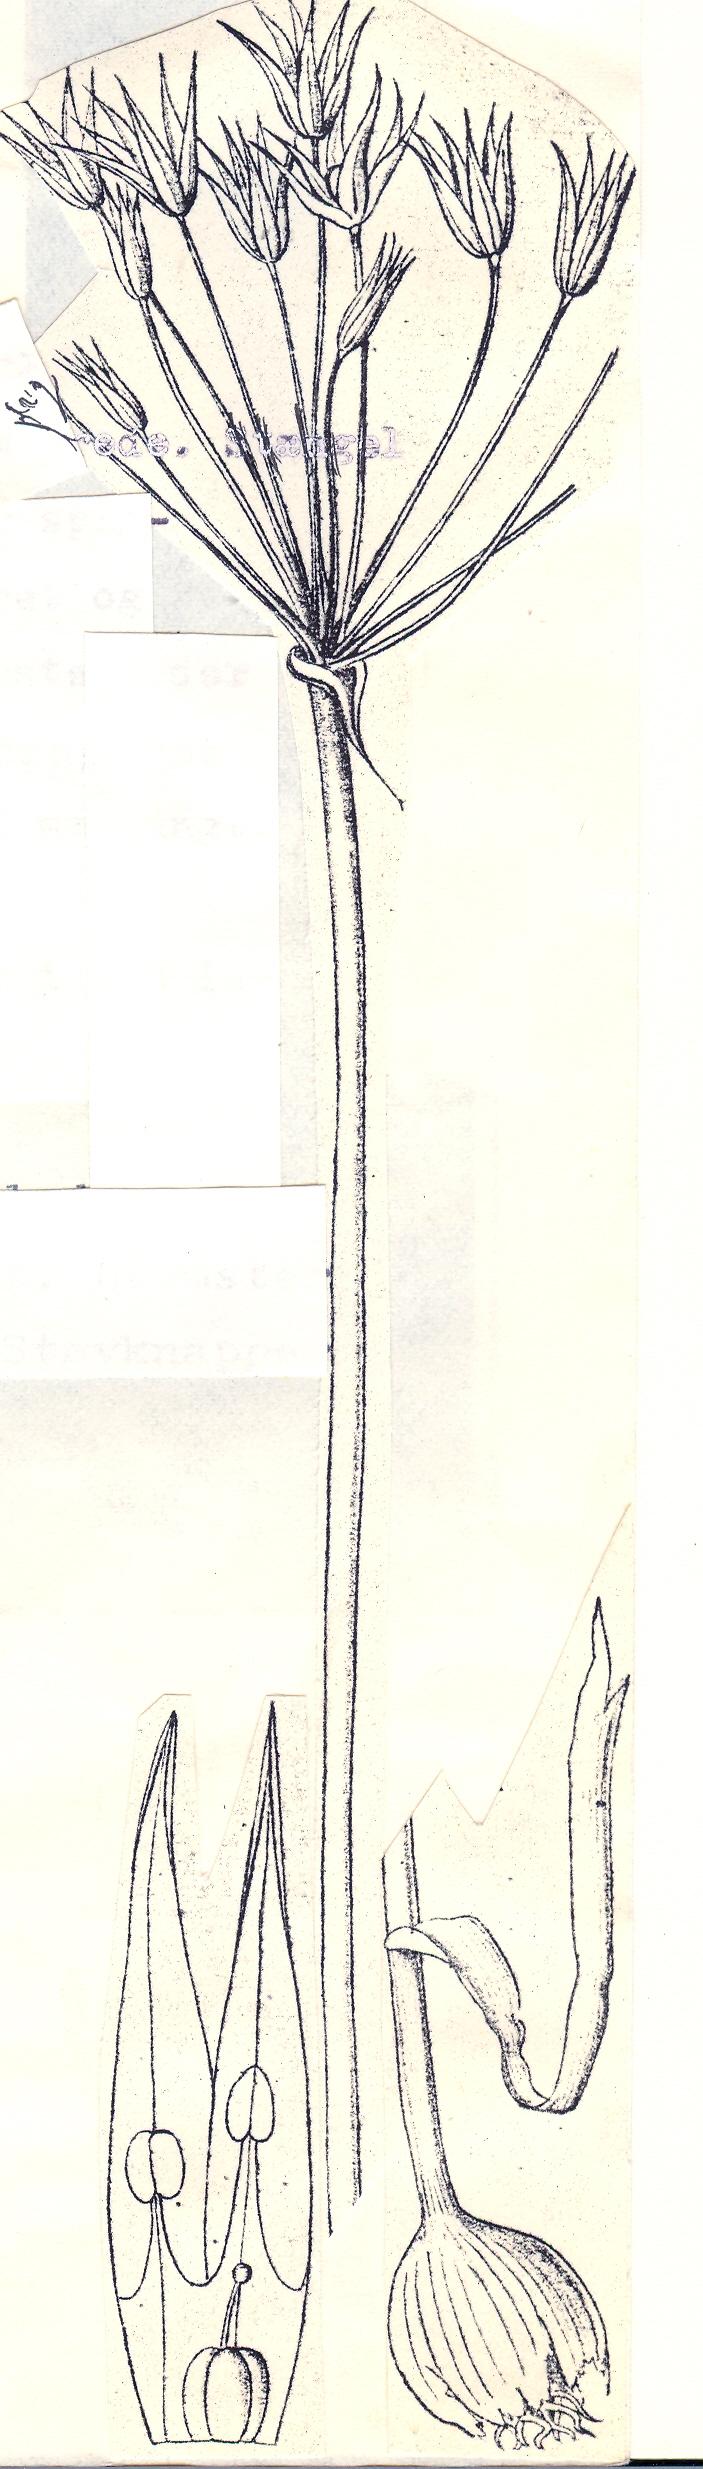 Allium%20iliense.jpg